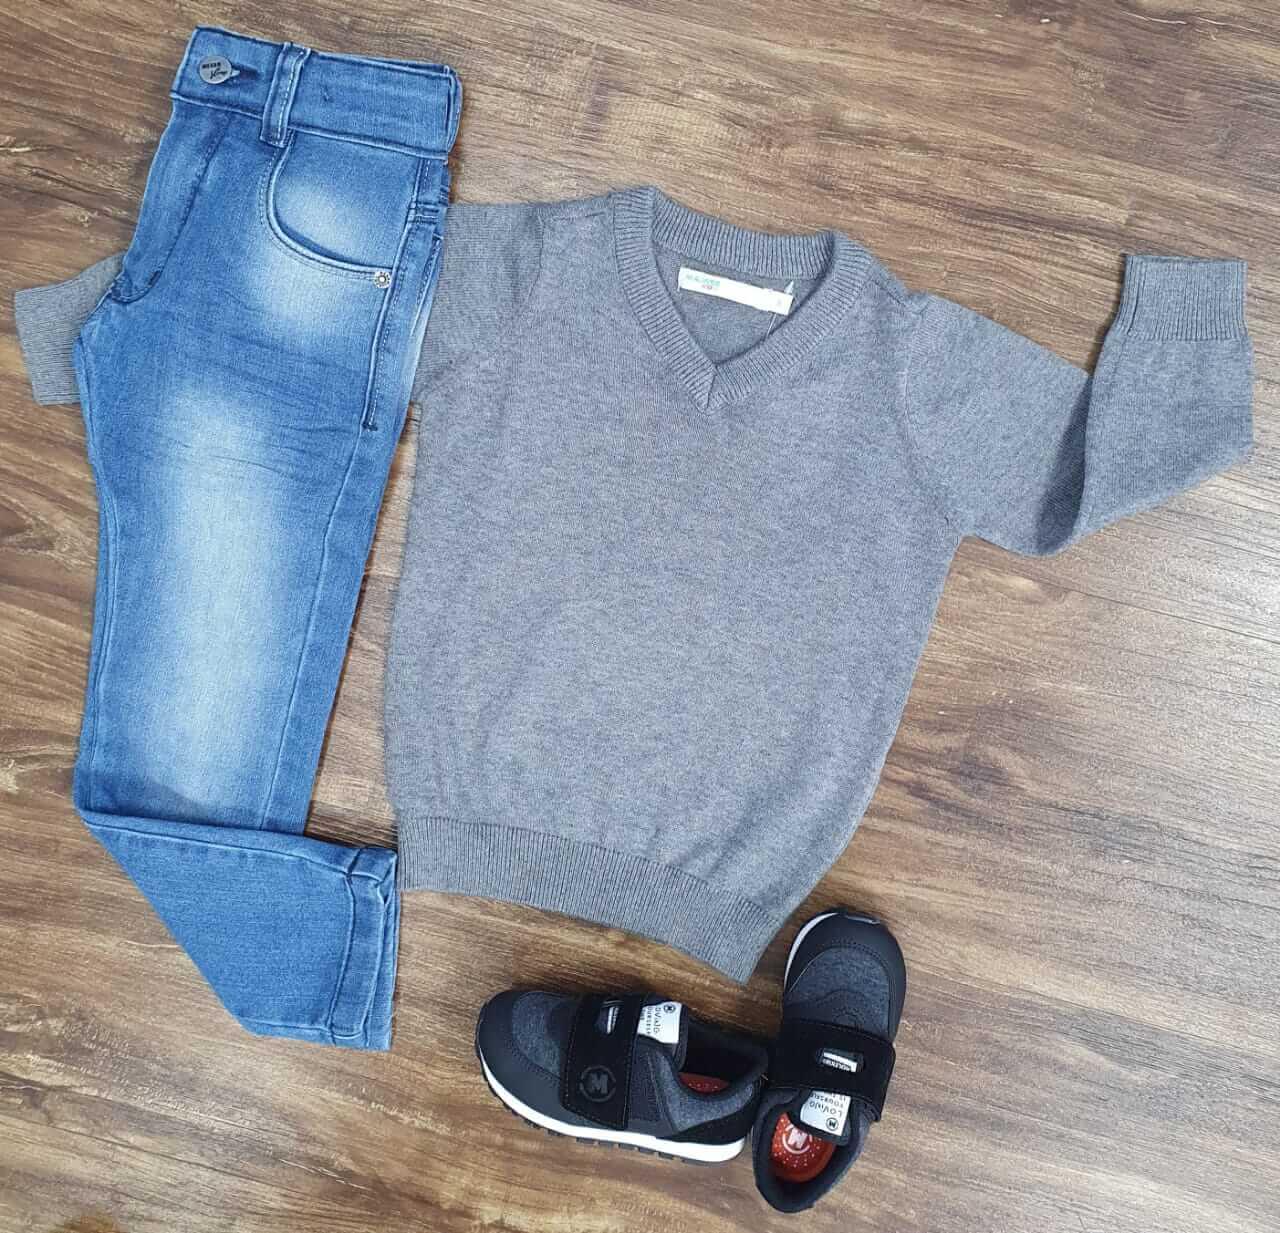 Calça Jeans com Suéter Cinza Infantil